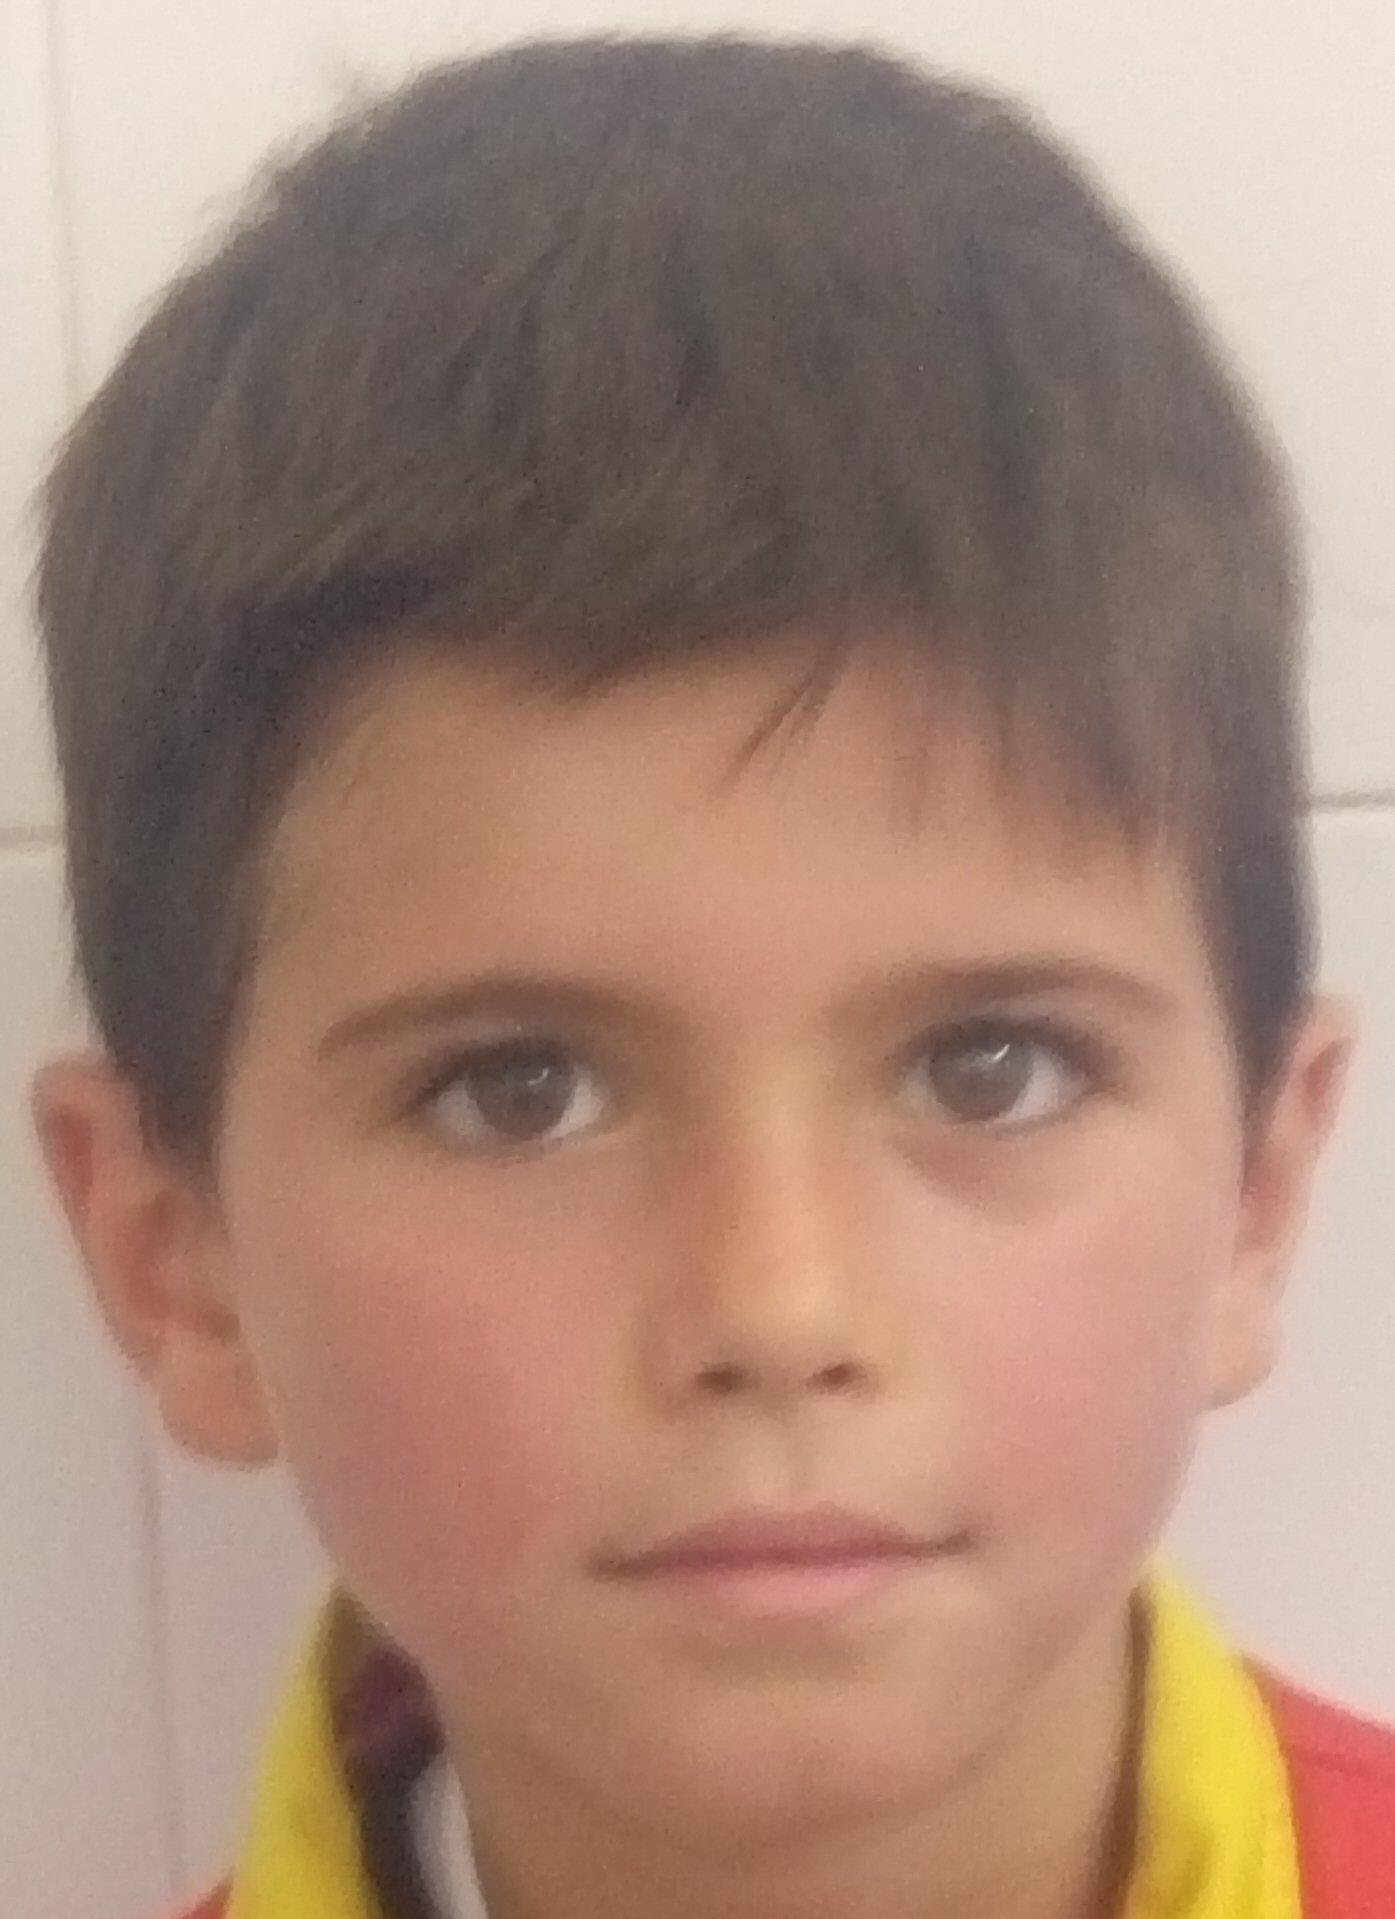 TOMÁS MIGUEL DA CRUZ GONÇALVES